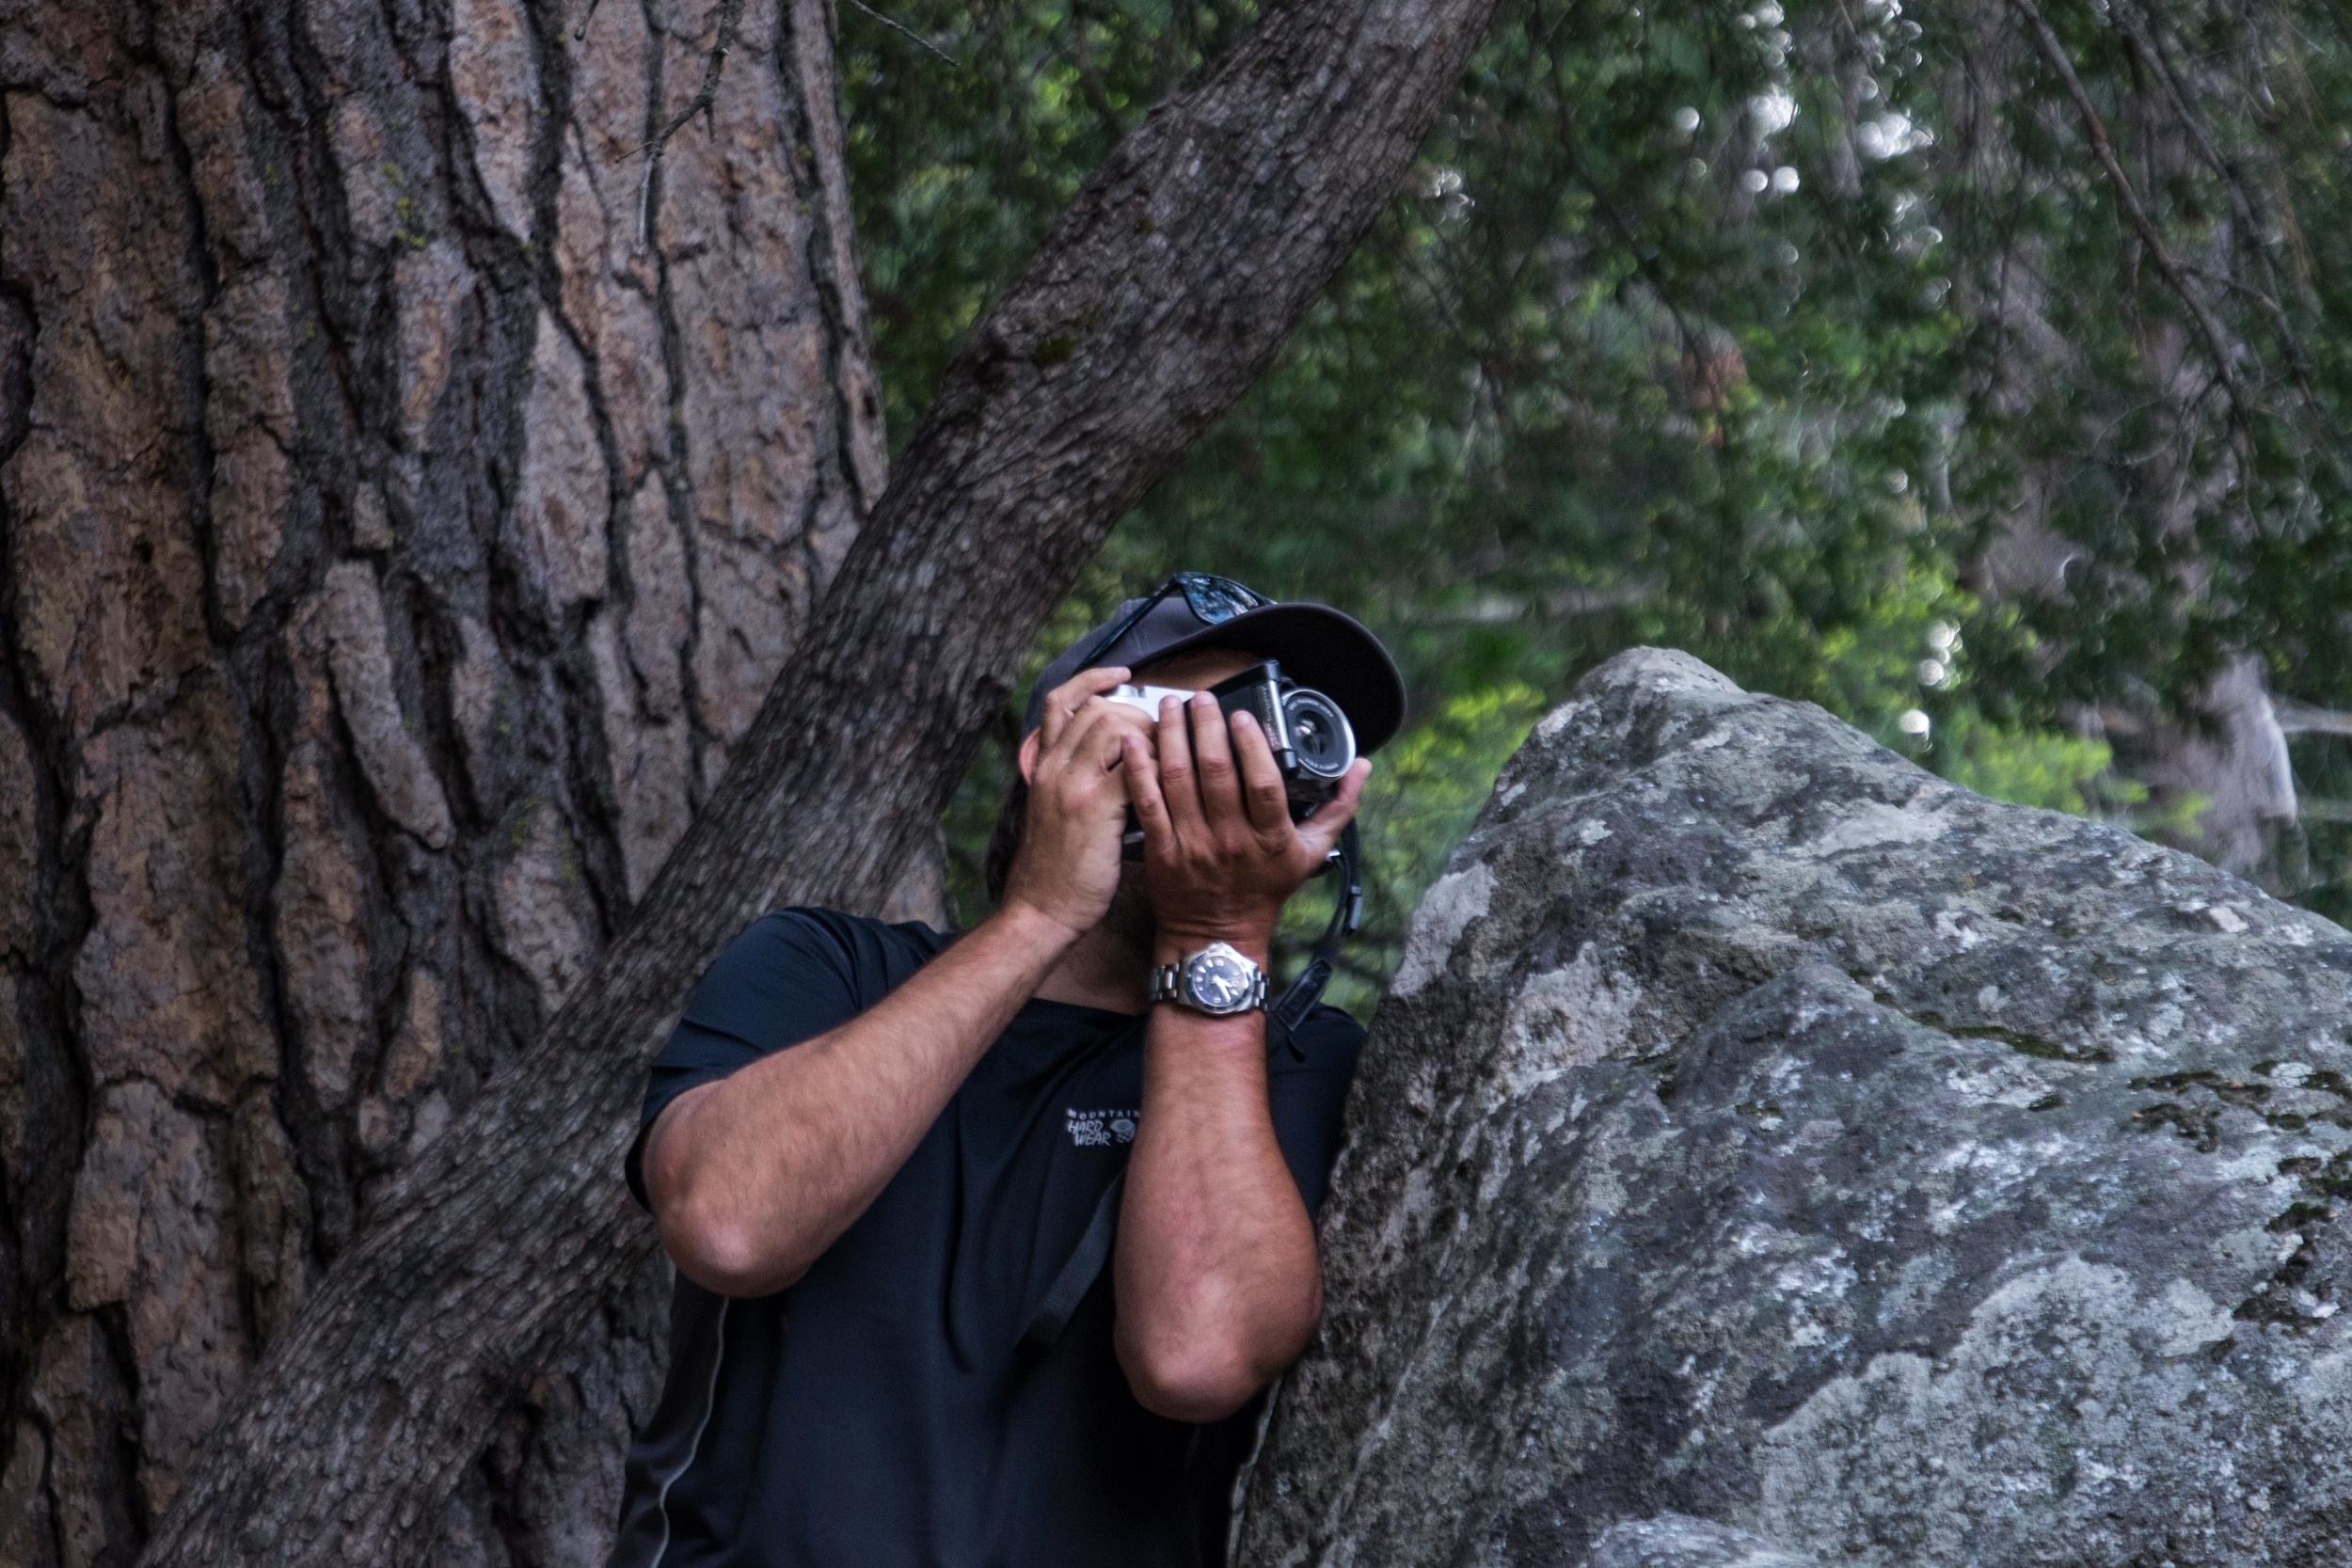 Jonathan Irish shooting with a Fujifilm Black and White Medium Format Film camera at Mirror Lake in Yosemite National Park.